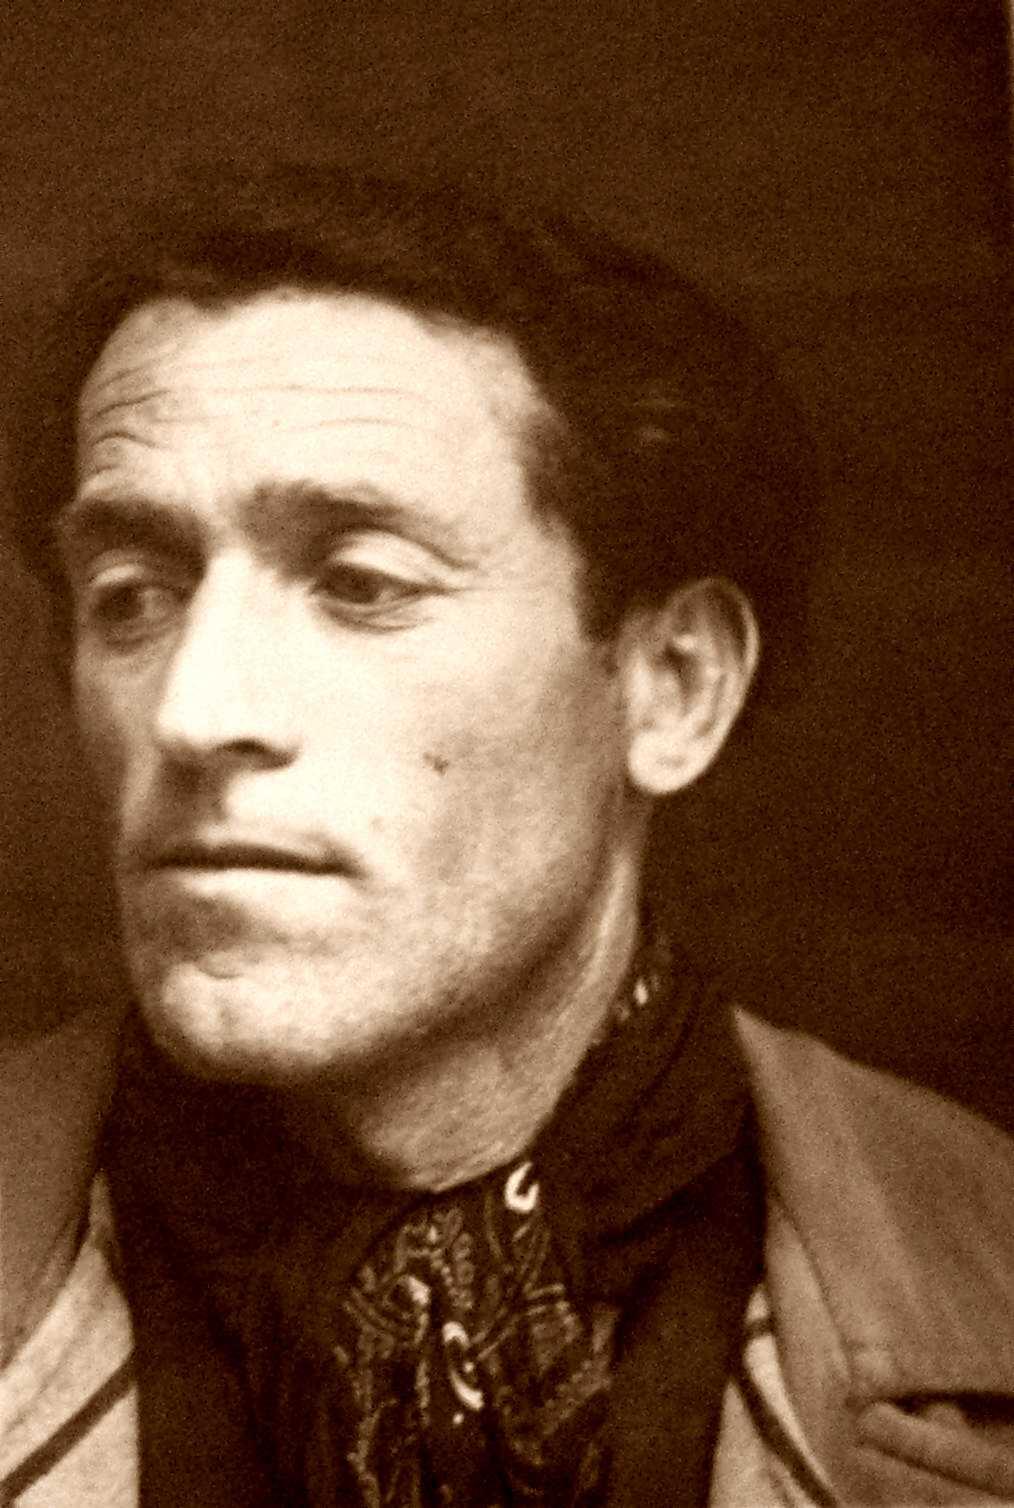 Bruno Lusvardi